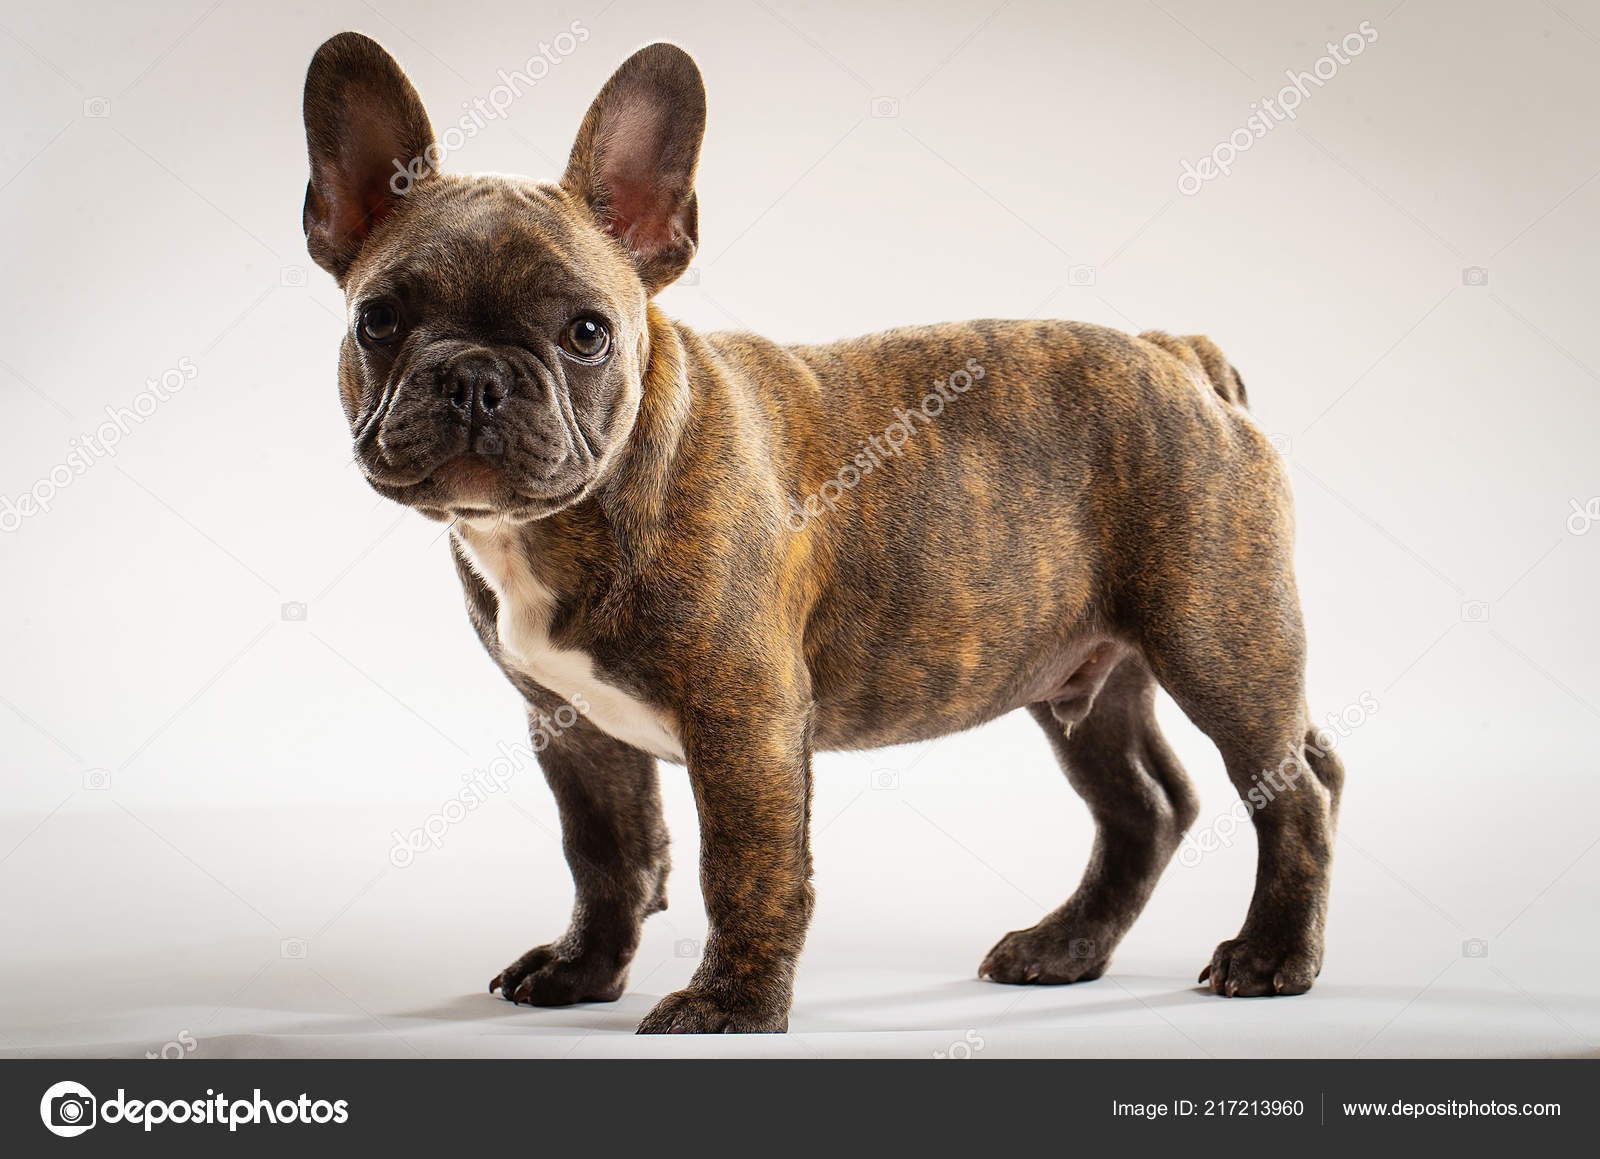 Small Brindle French Bulldog Puppy Portrait Stock Photo C Mph Photo 217213960